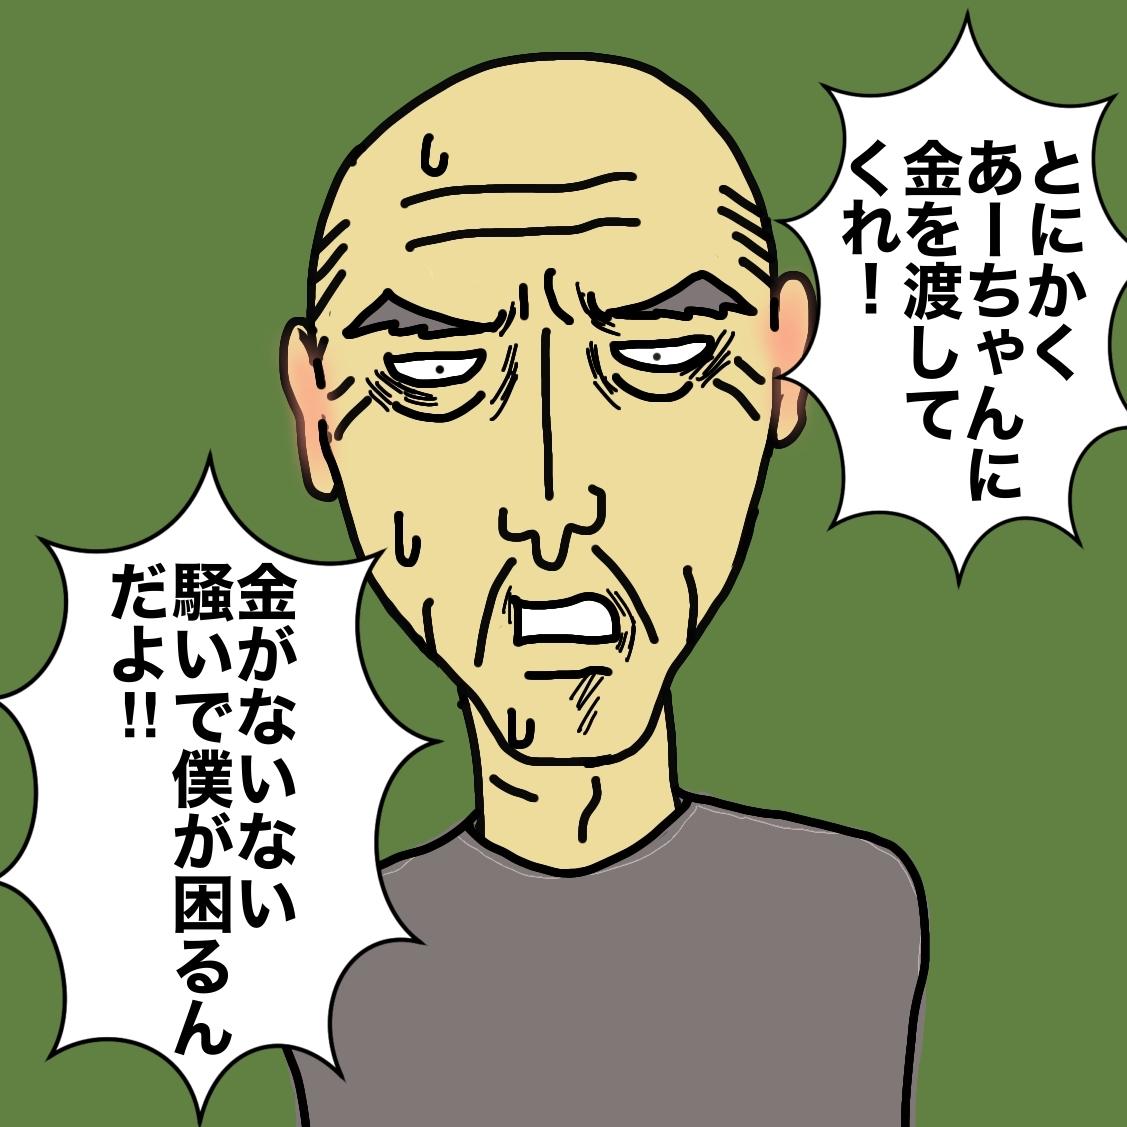 Image (6).jpeg